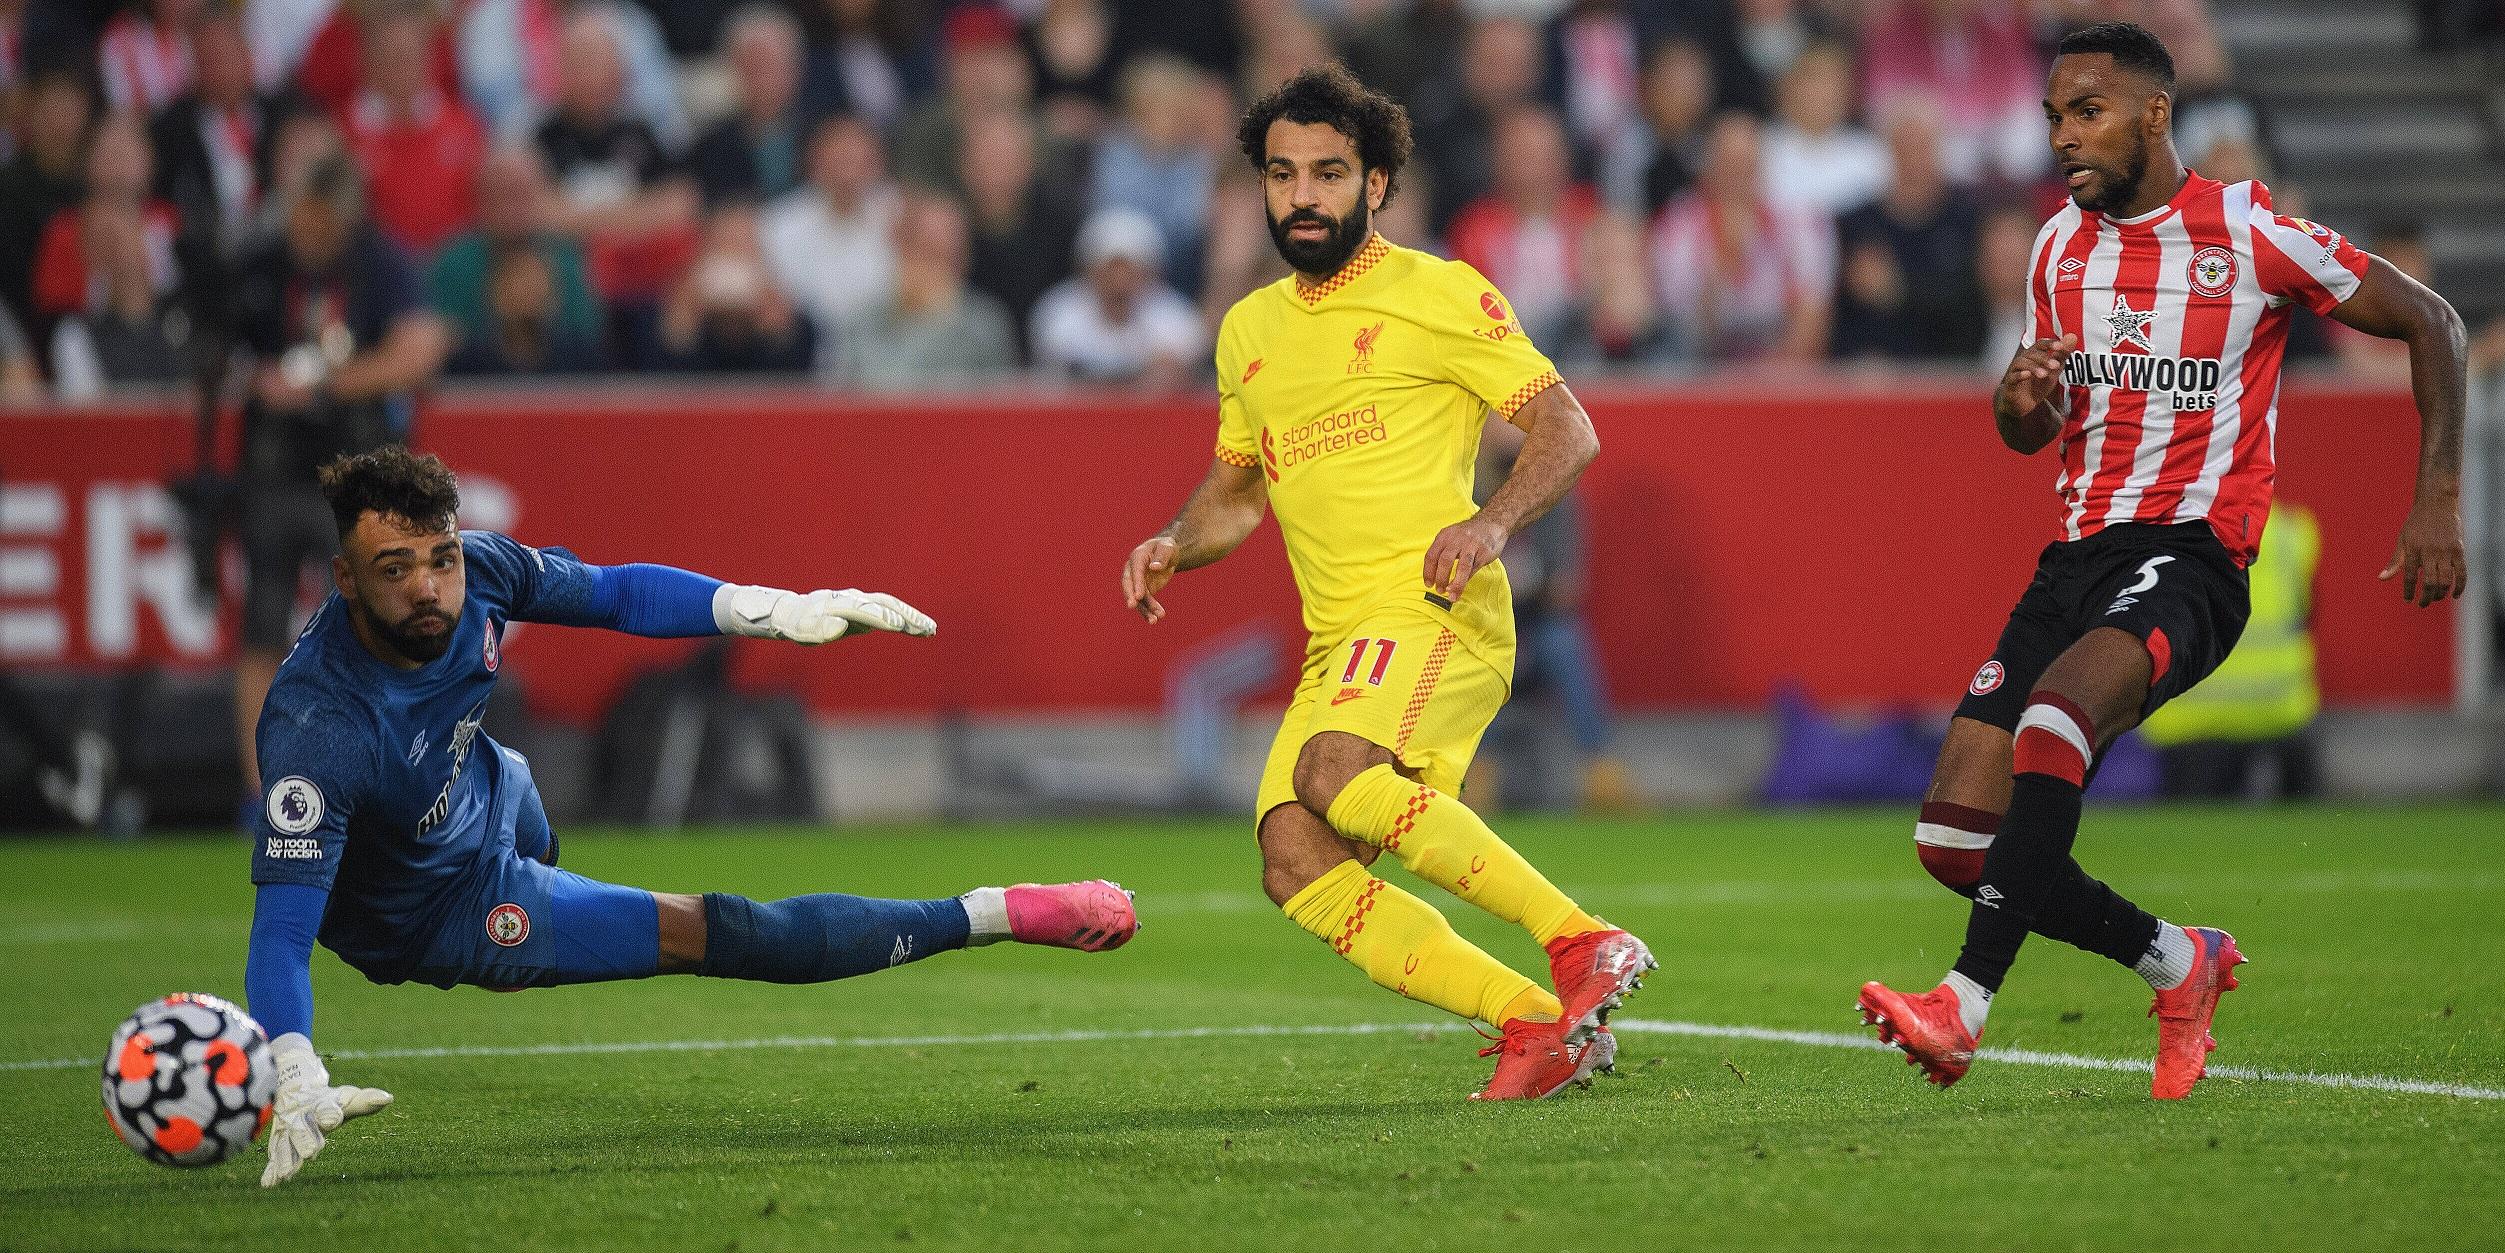 Klopp tips Salah to go for Alan Shearer's record as 'next target'